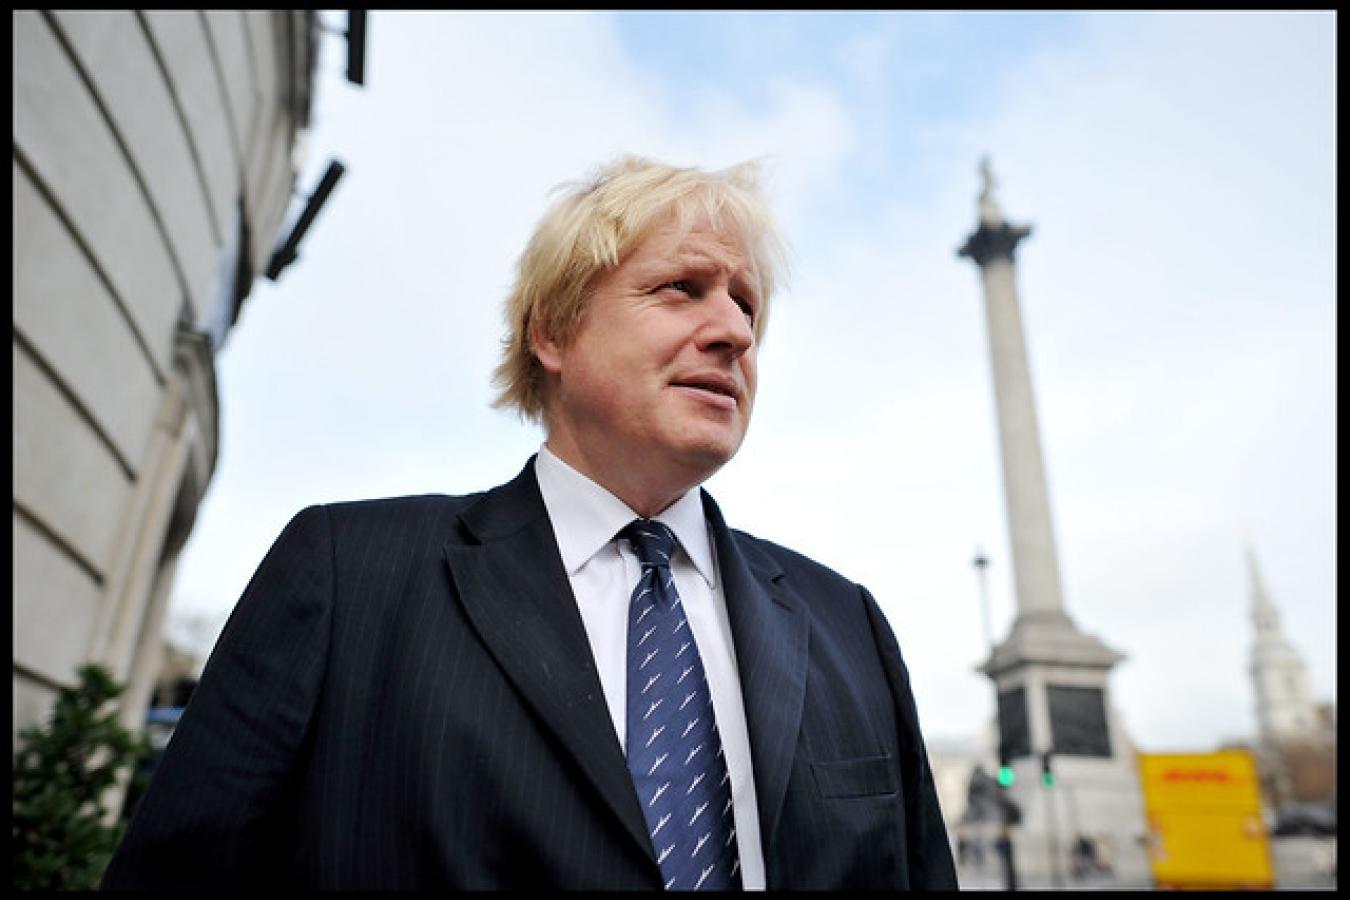 Boris Johnson to become Prime Minister